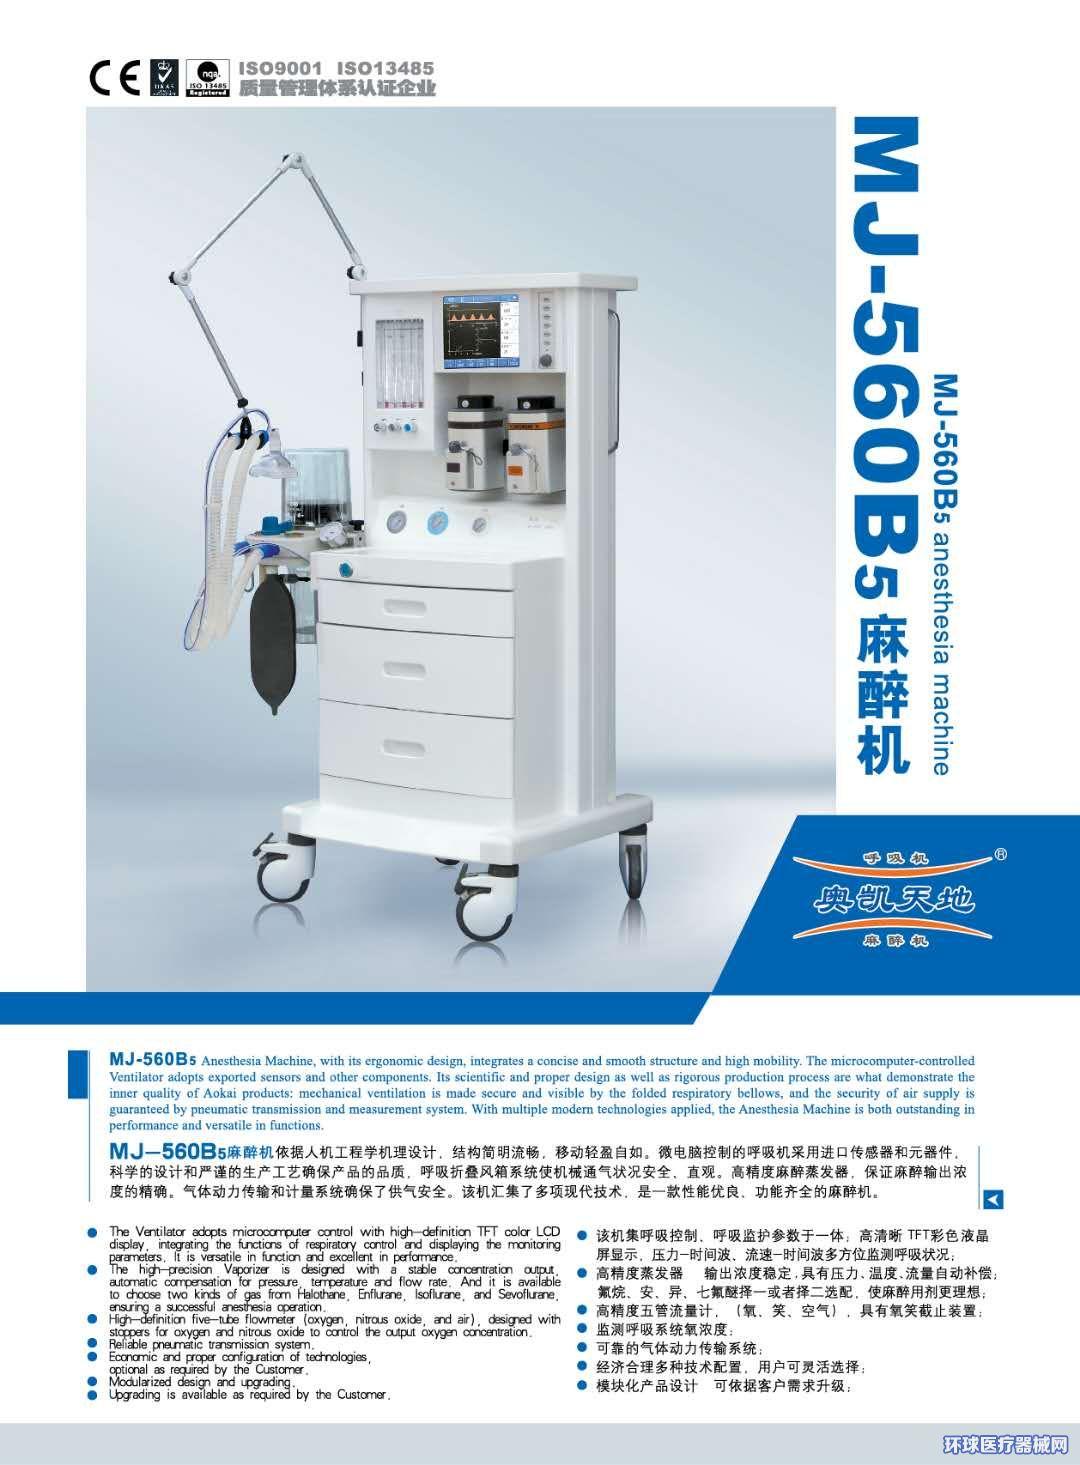 MJ-560B5麻醉机